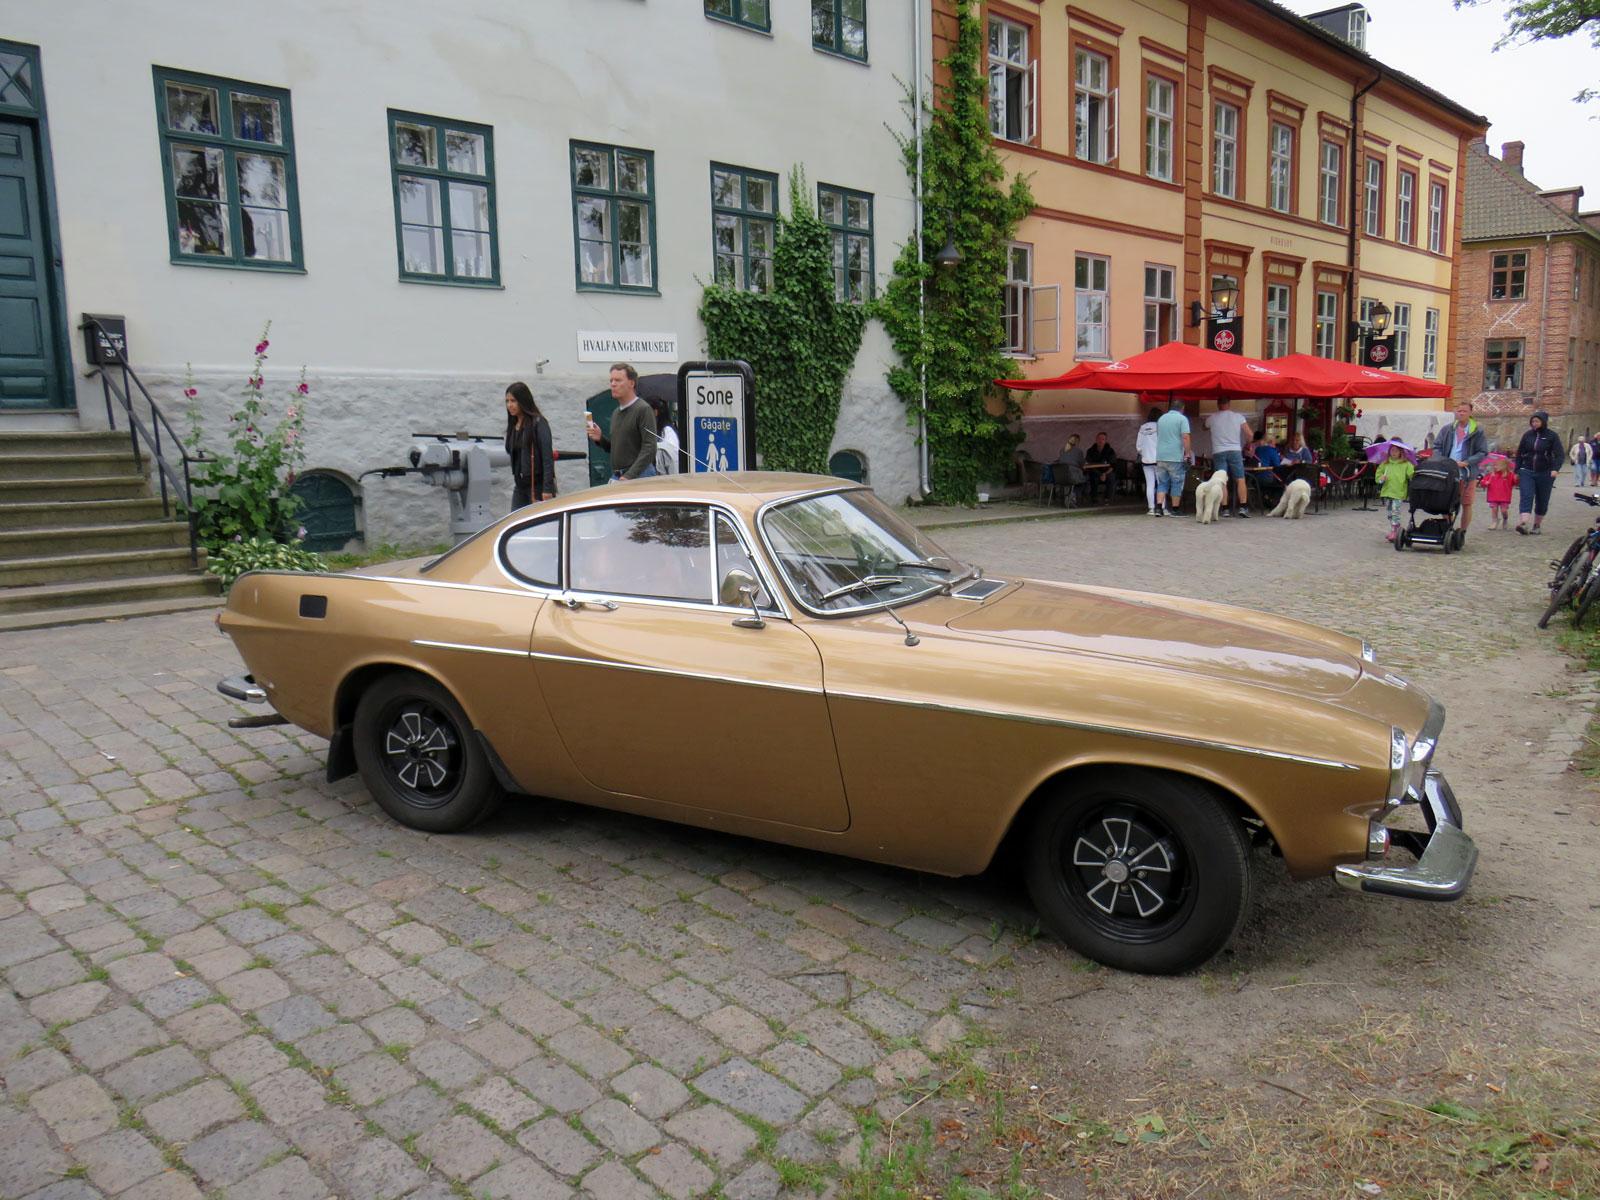 1971 Volvo P1800 Fredrikstad gamlebyen classic cars